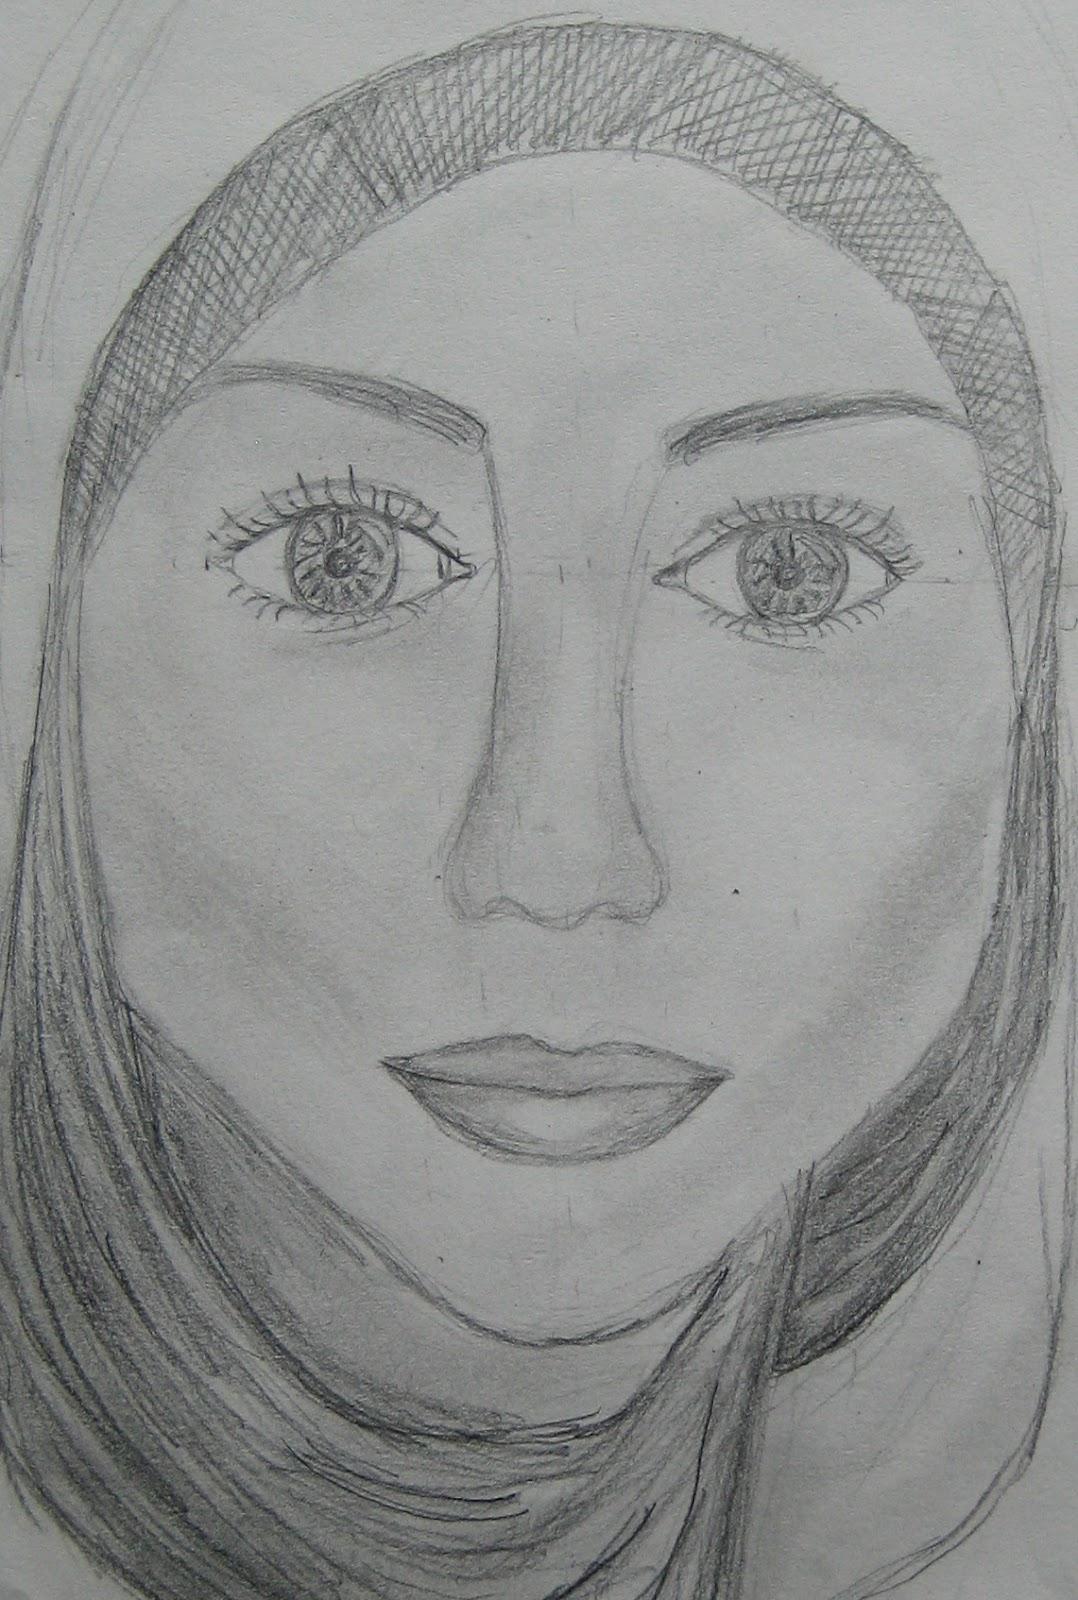 Student Artwork Year 9 Self Portraits